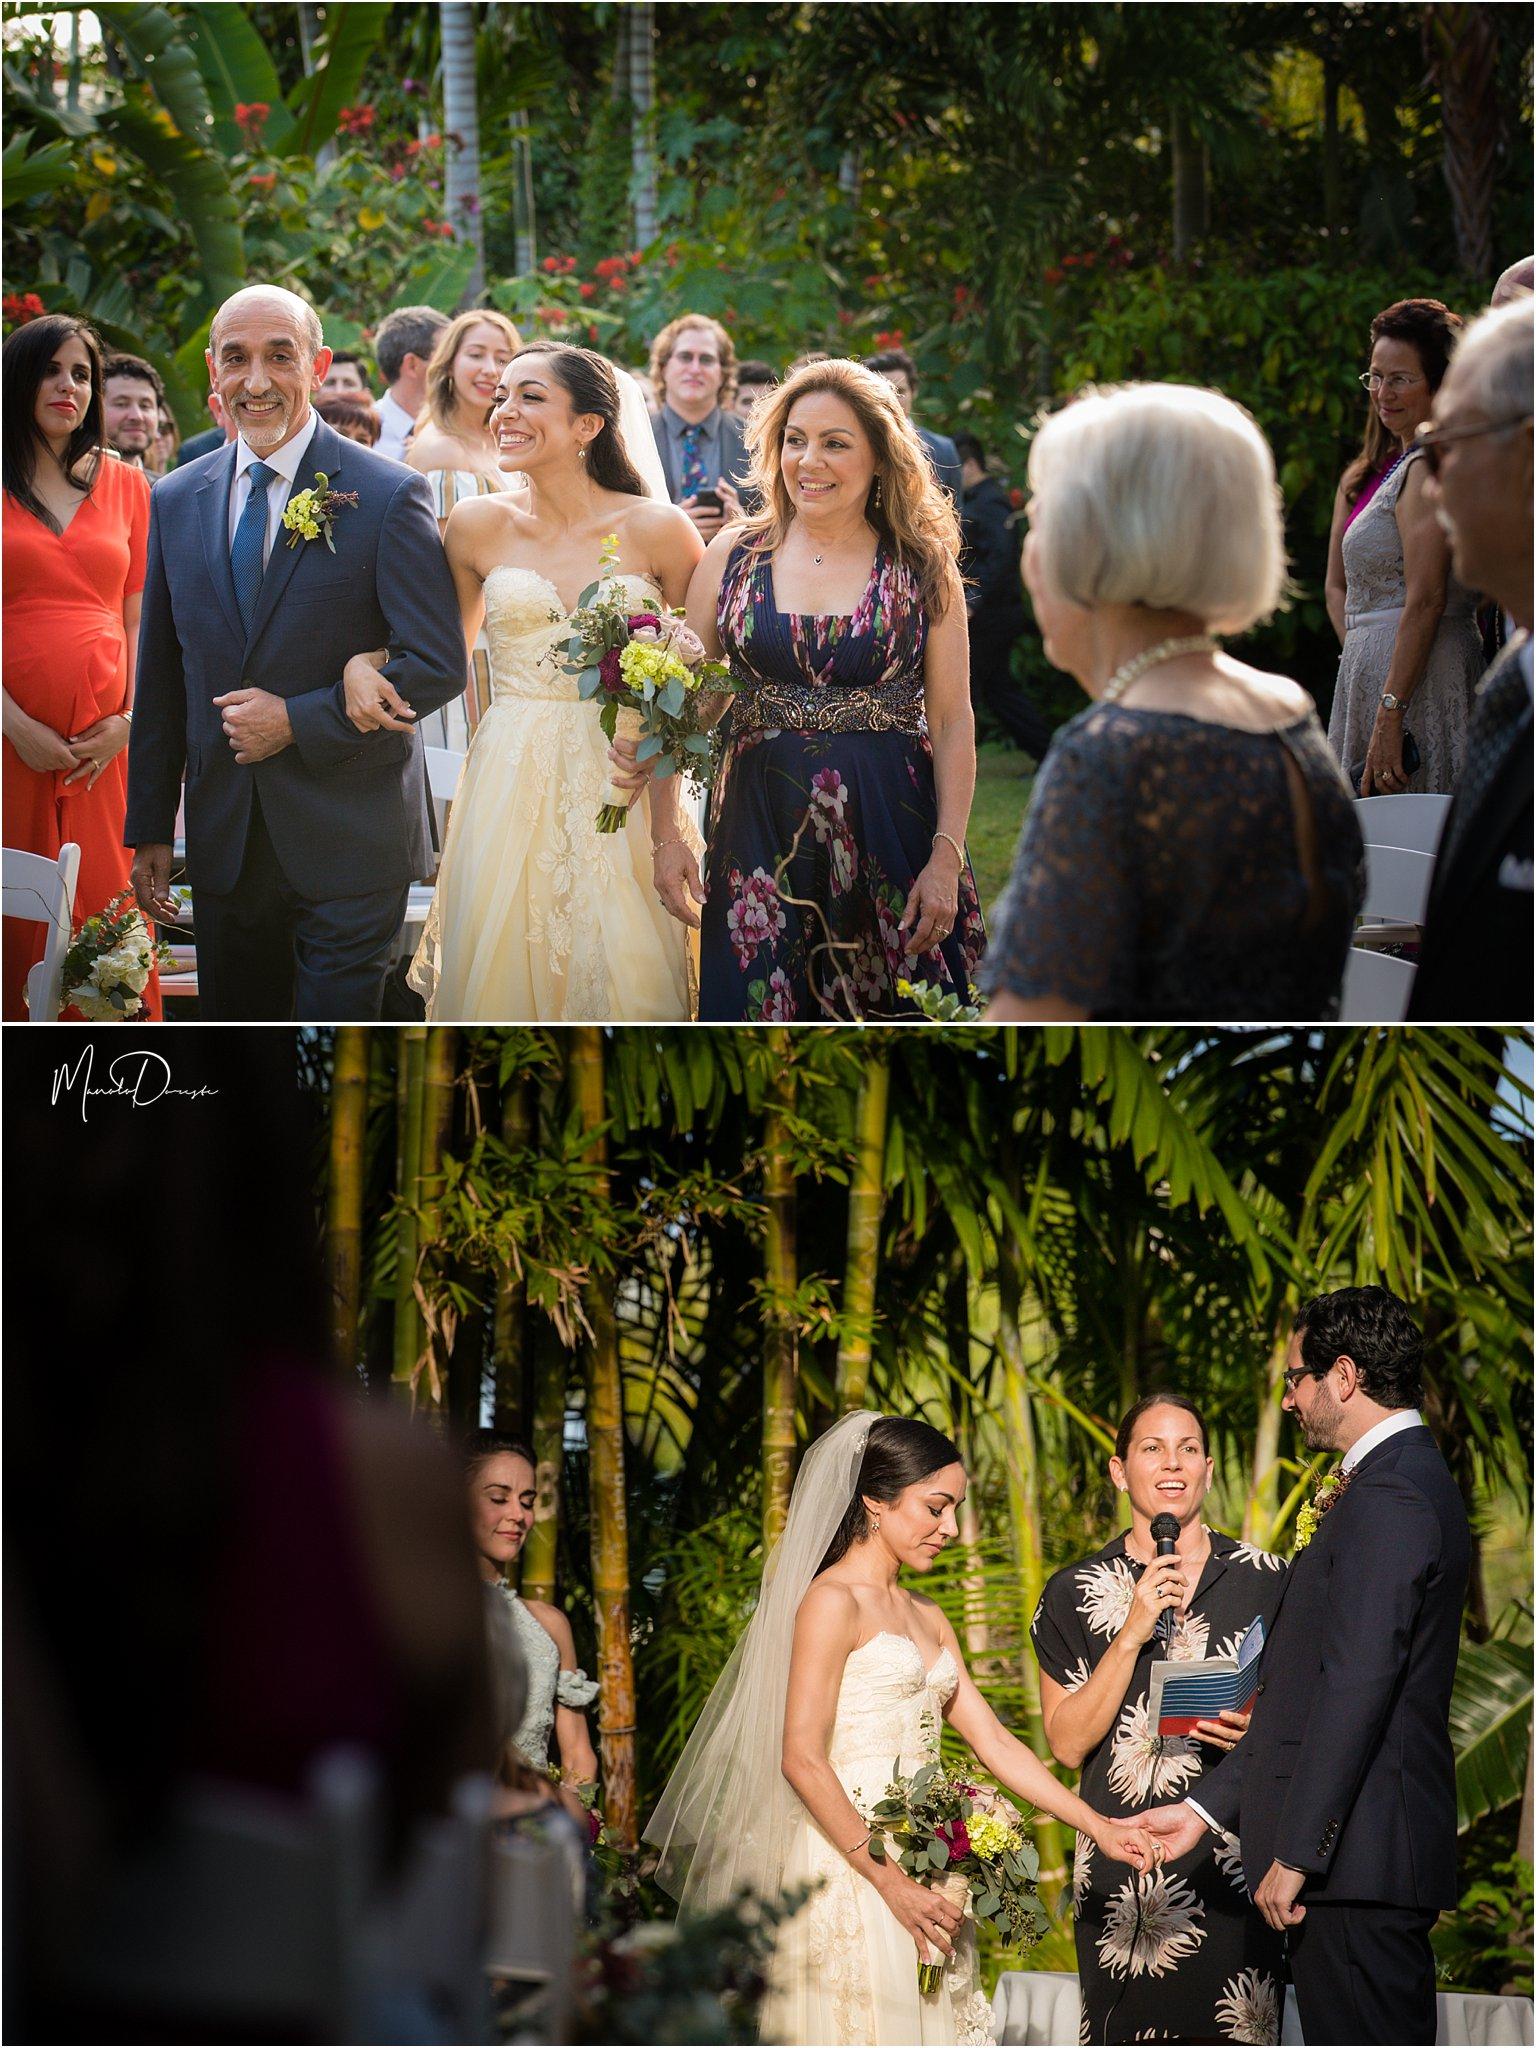 0518_ManoloDoreste_InFocusStudios_Wedding_Family_Photography_Miami_MiamiPhotographer.jpg